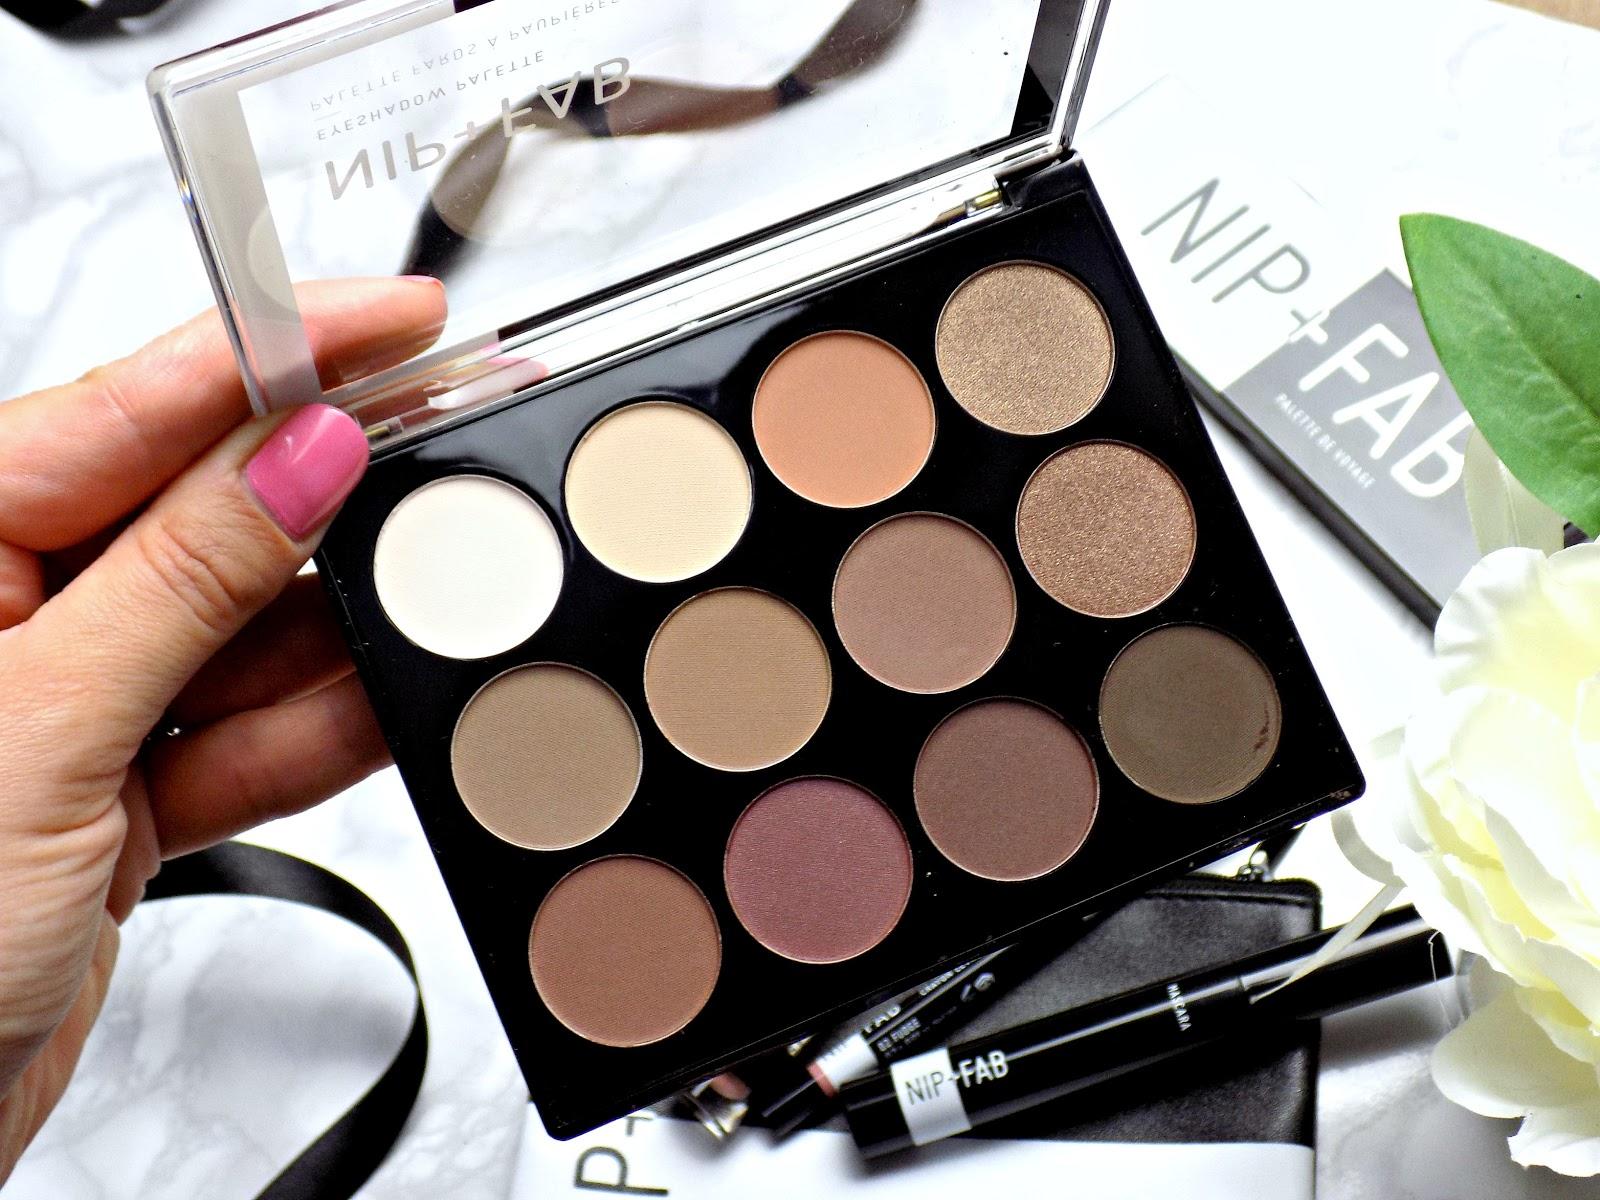 Nip & Fab Makeup Eyshadow Palette